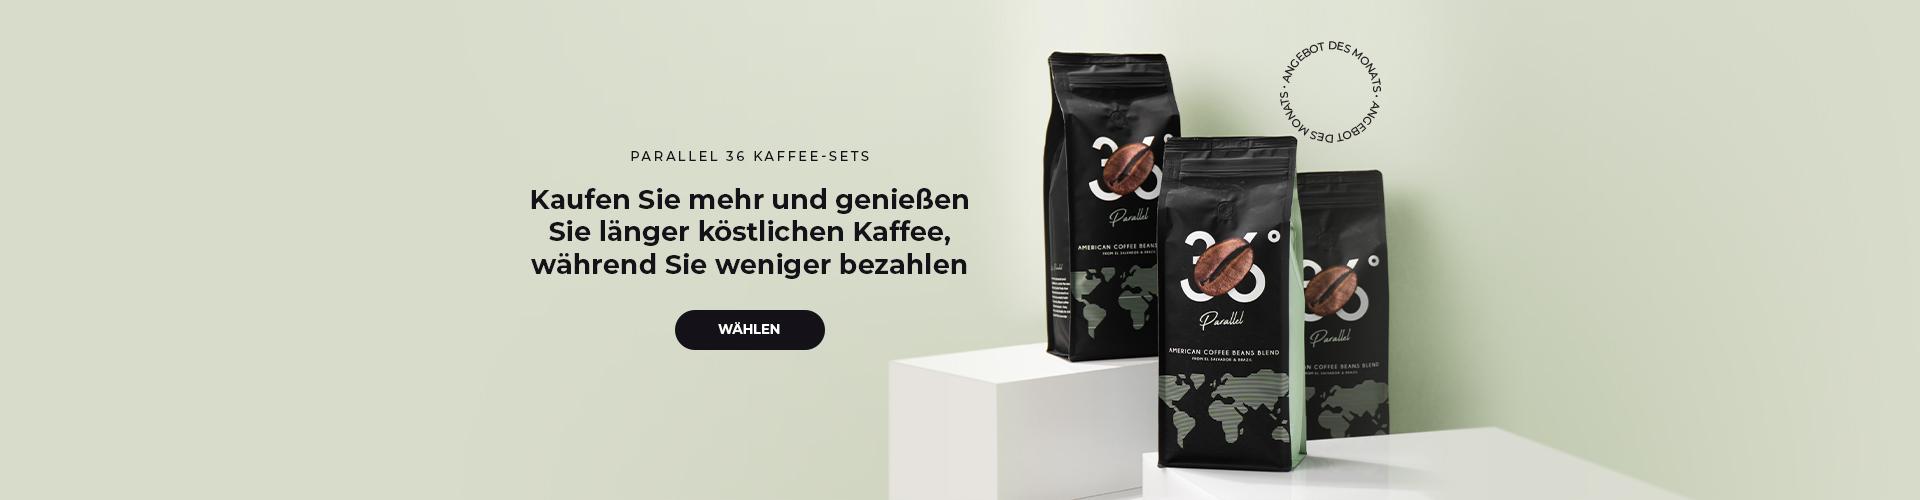 Parallel 36 Kaffee-Sets